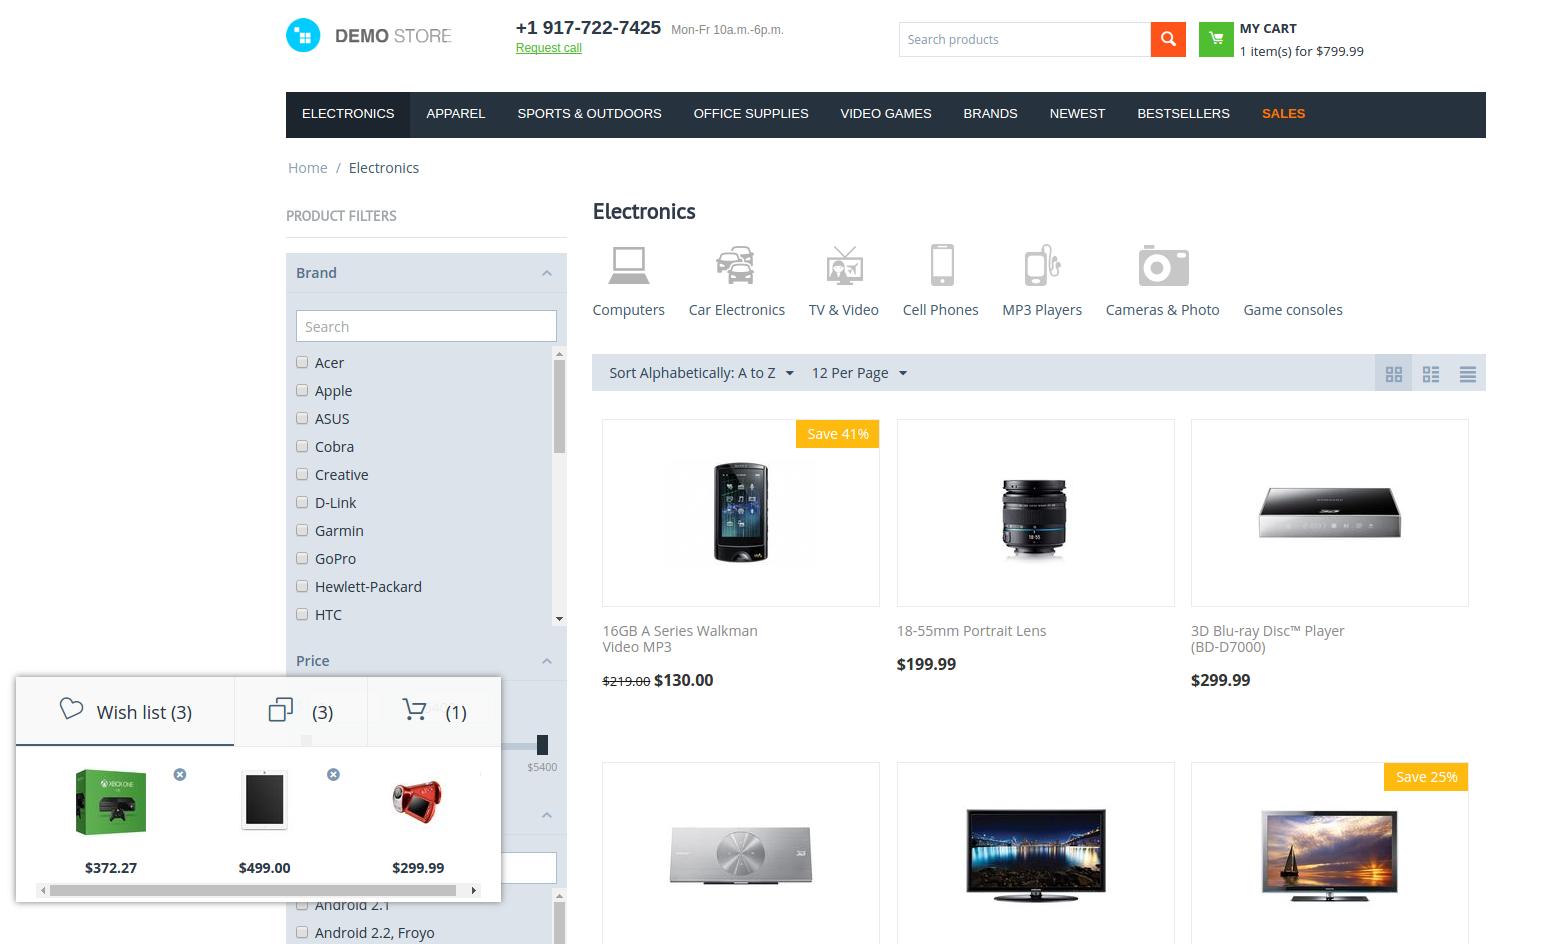 Product_lists_pop-up